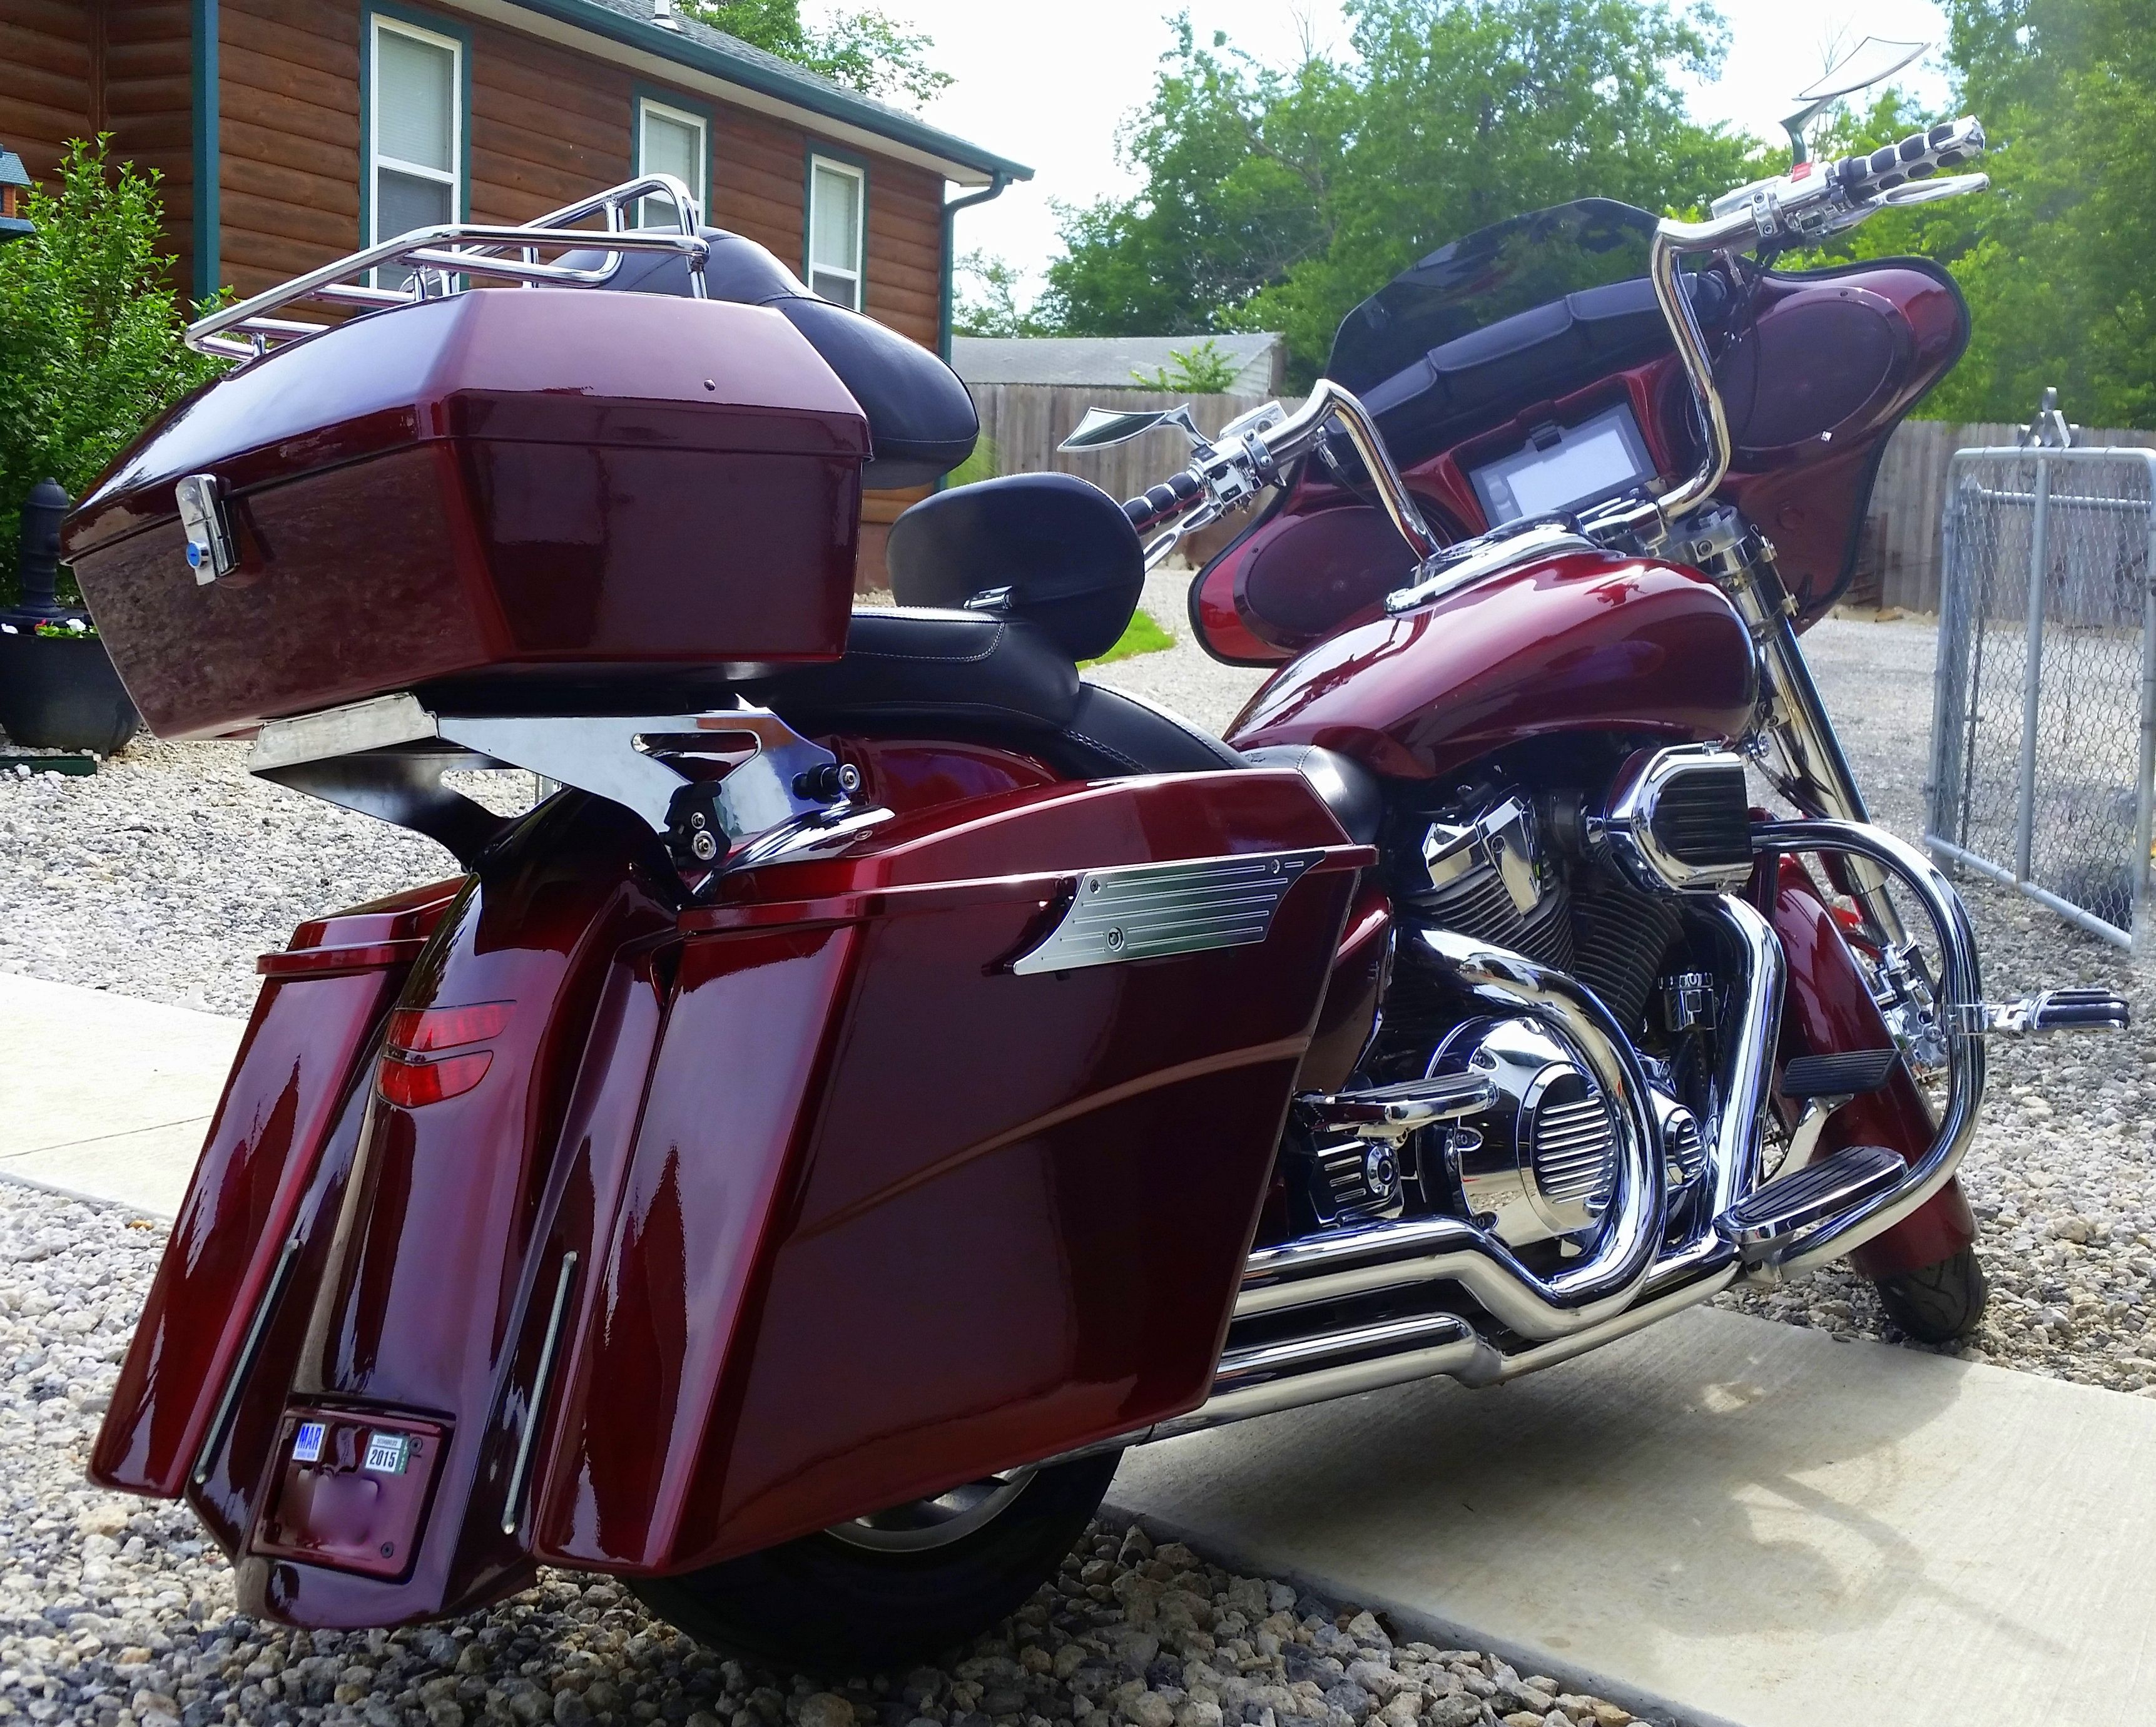 small resolution of honda 1800 vtx 2004 custom baggers harley davidson cars motorcycles honda dream